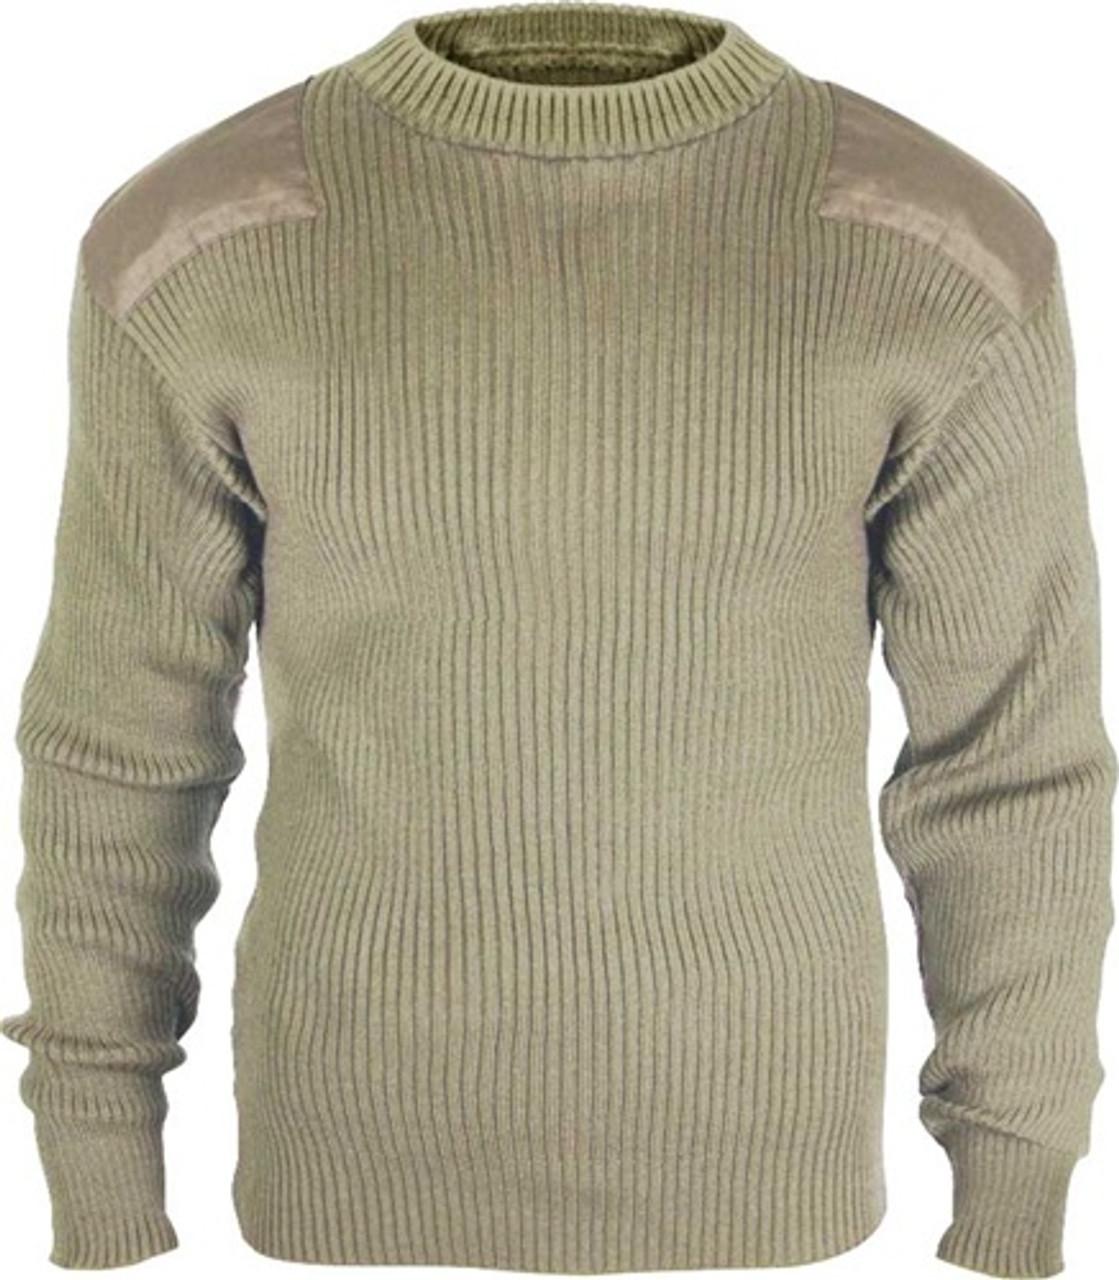 Acrylic Commando Sweater - Khaki from Hessen Tactical